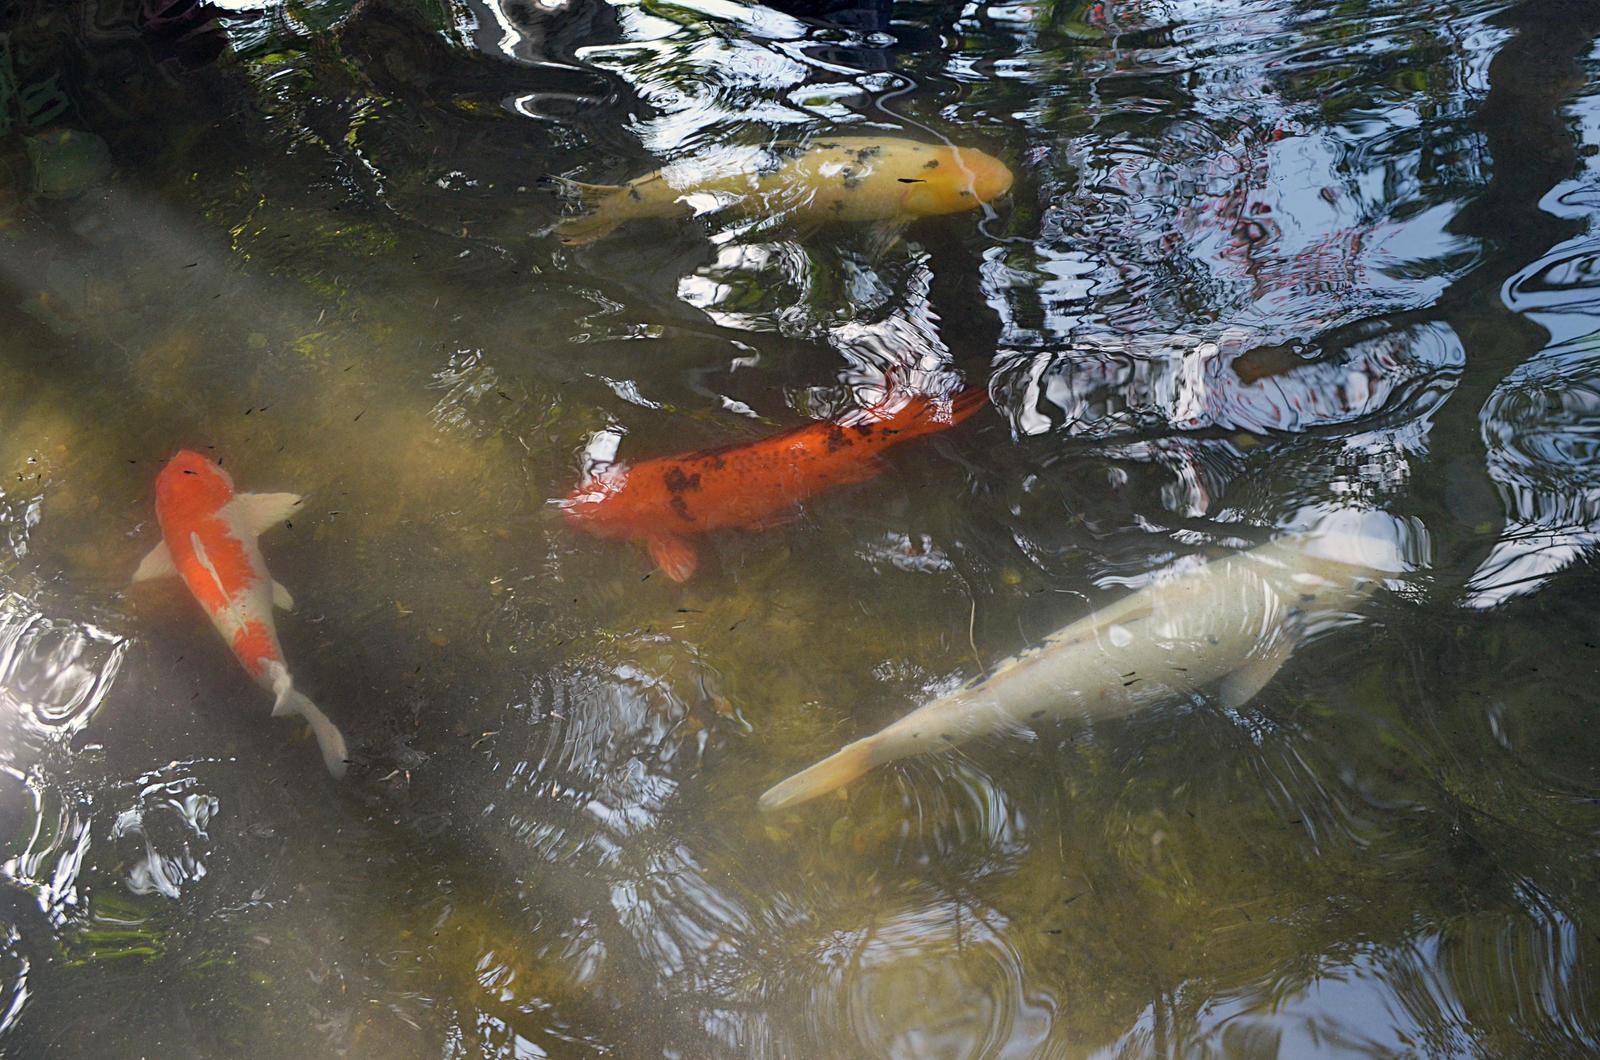 Koi Fish Pond Stock Photo Dsc 0706 By Annamae22 On Deviantart